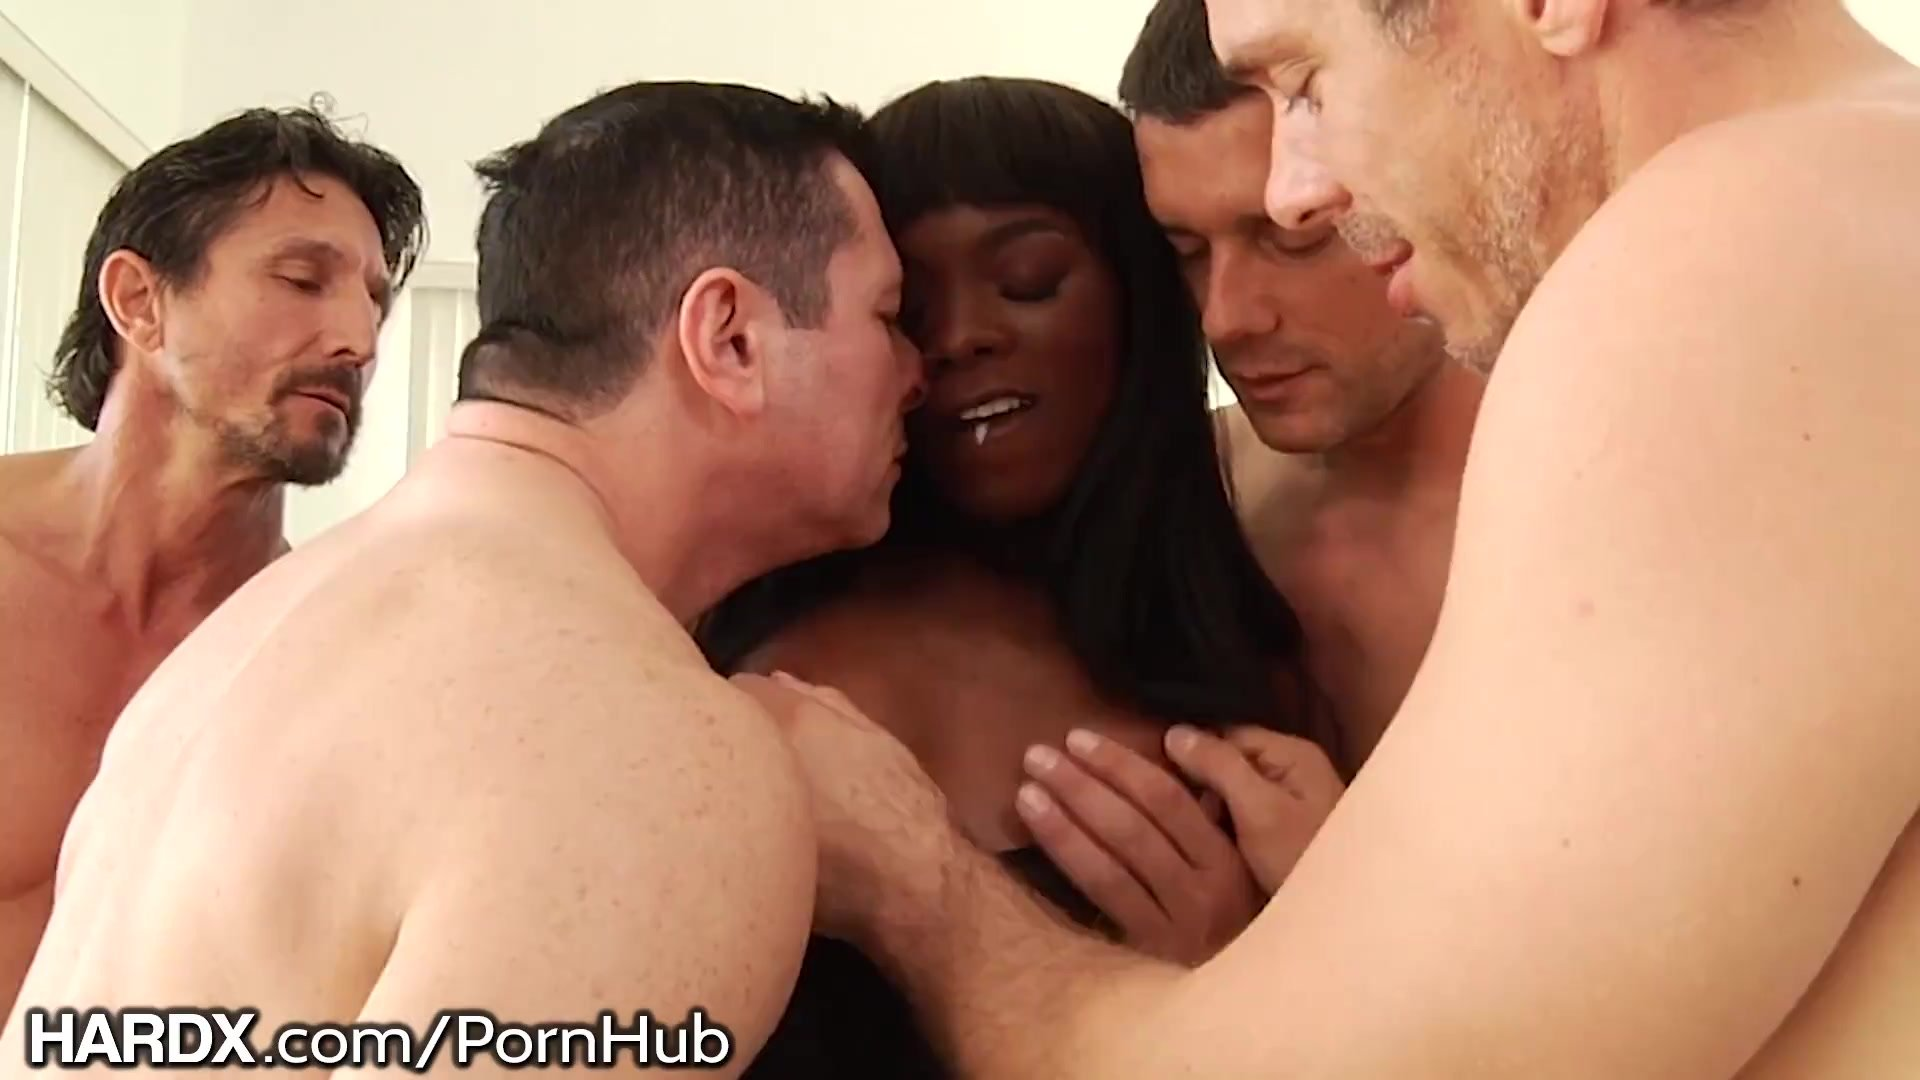 HardX Ebony Babe Ana Foxxx 1st DP Rough Gangbang w/ Big Dicks